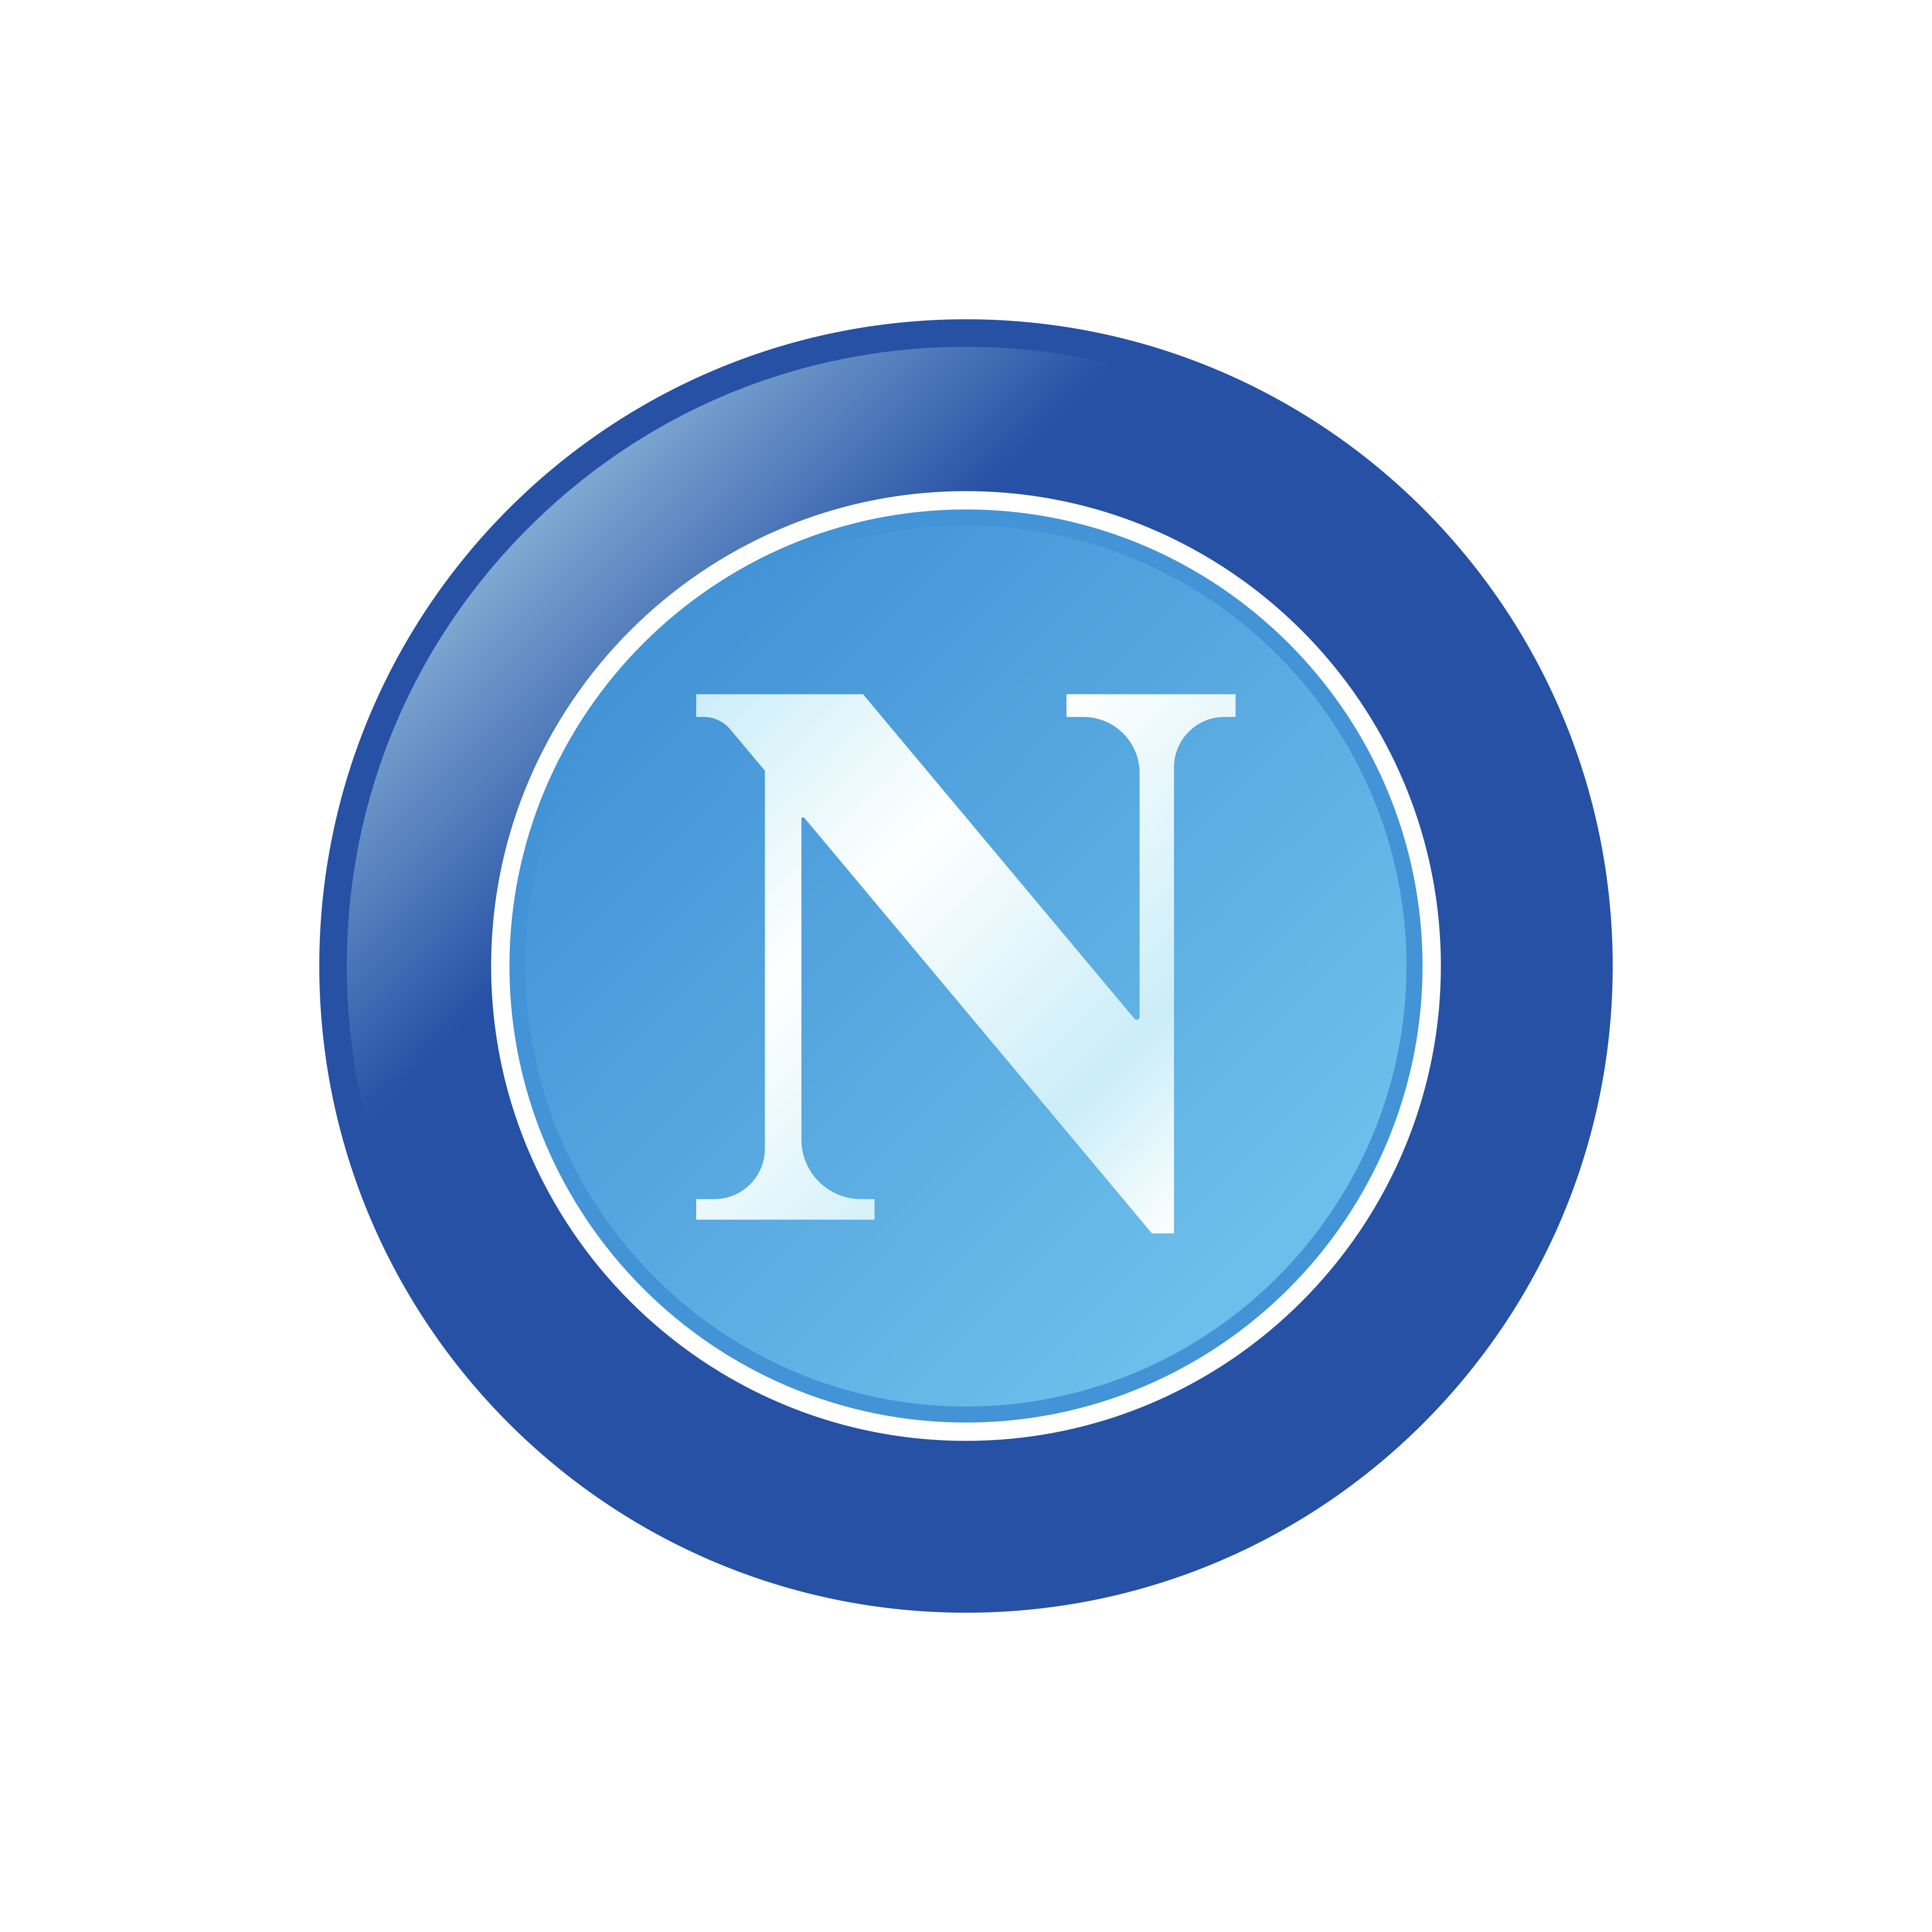 napoli logo 0 - Napoli Logo - Escudo